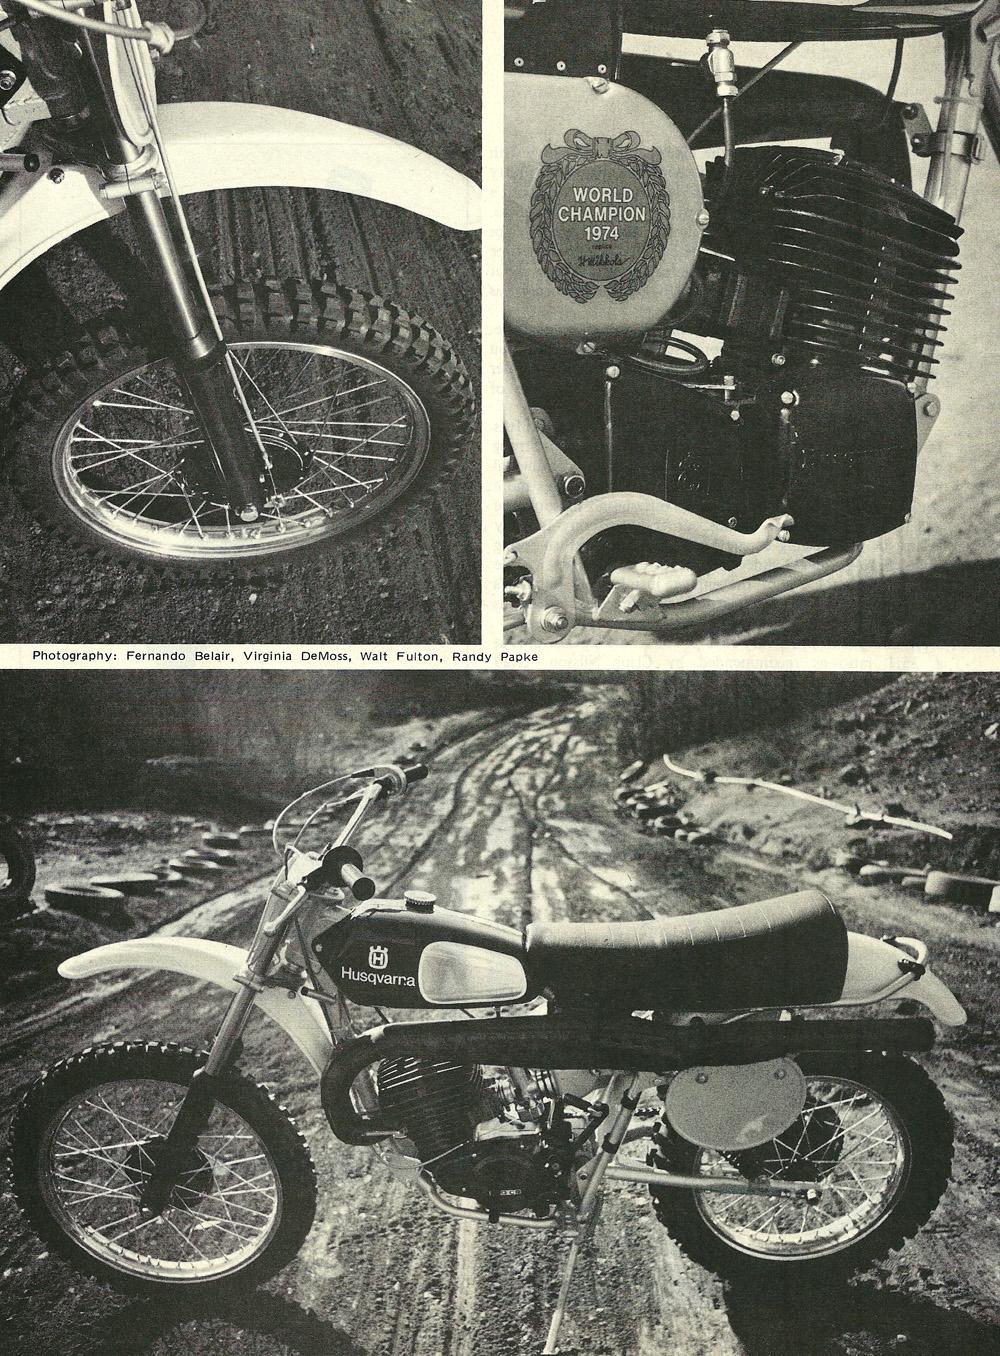 1975 Husqvarna 360CR road test 04.jpg